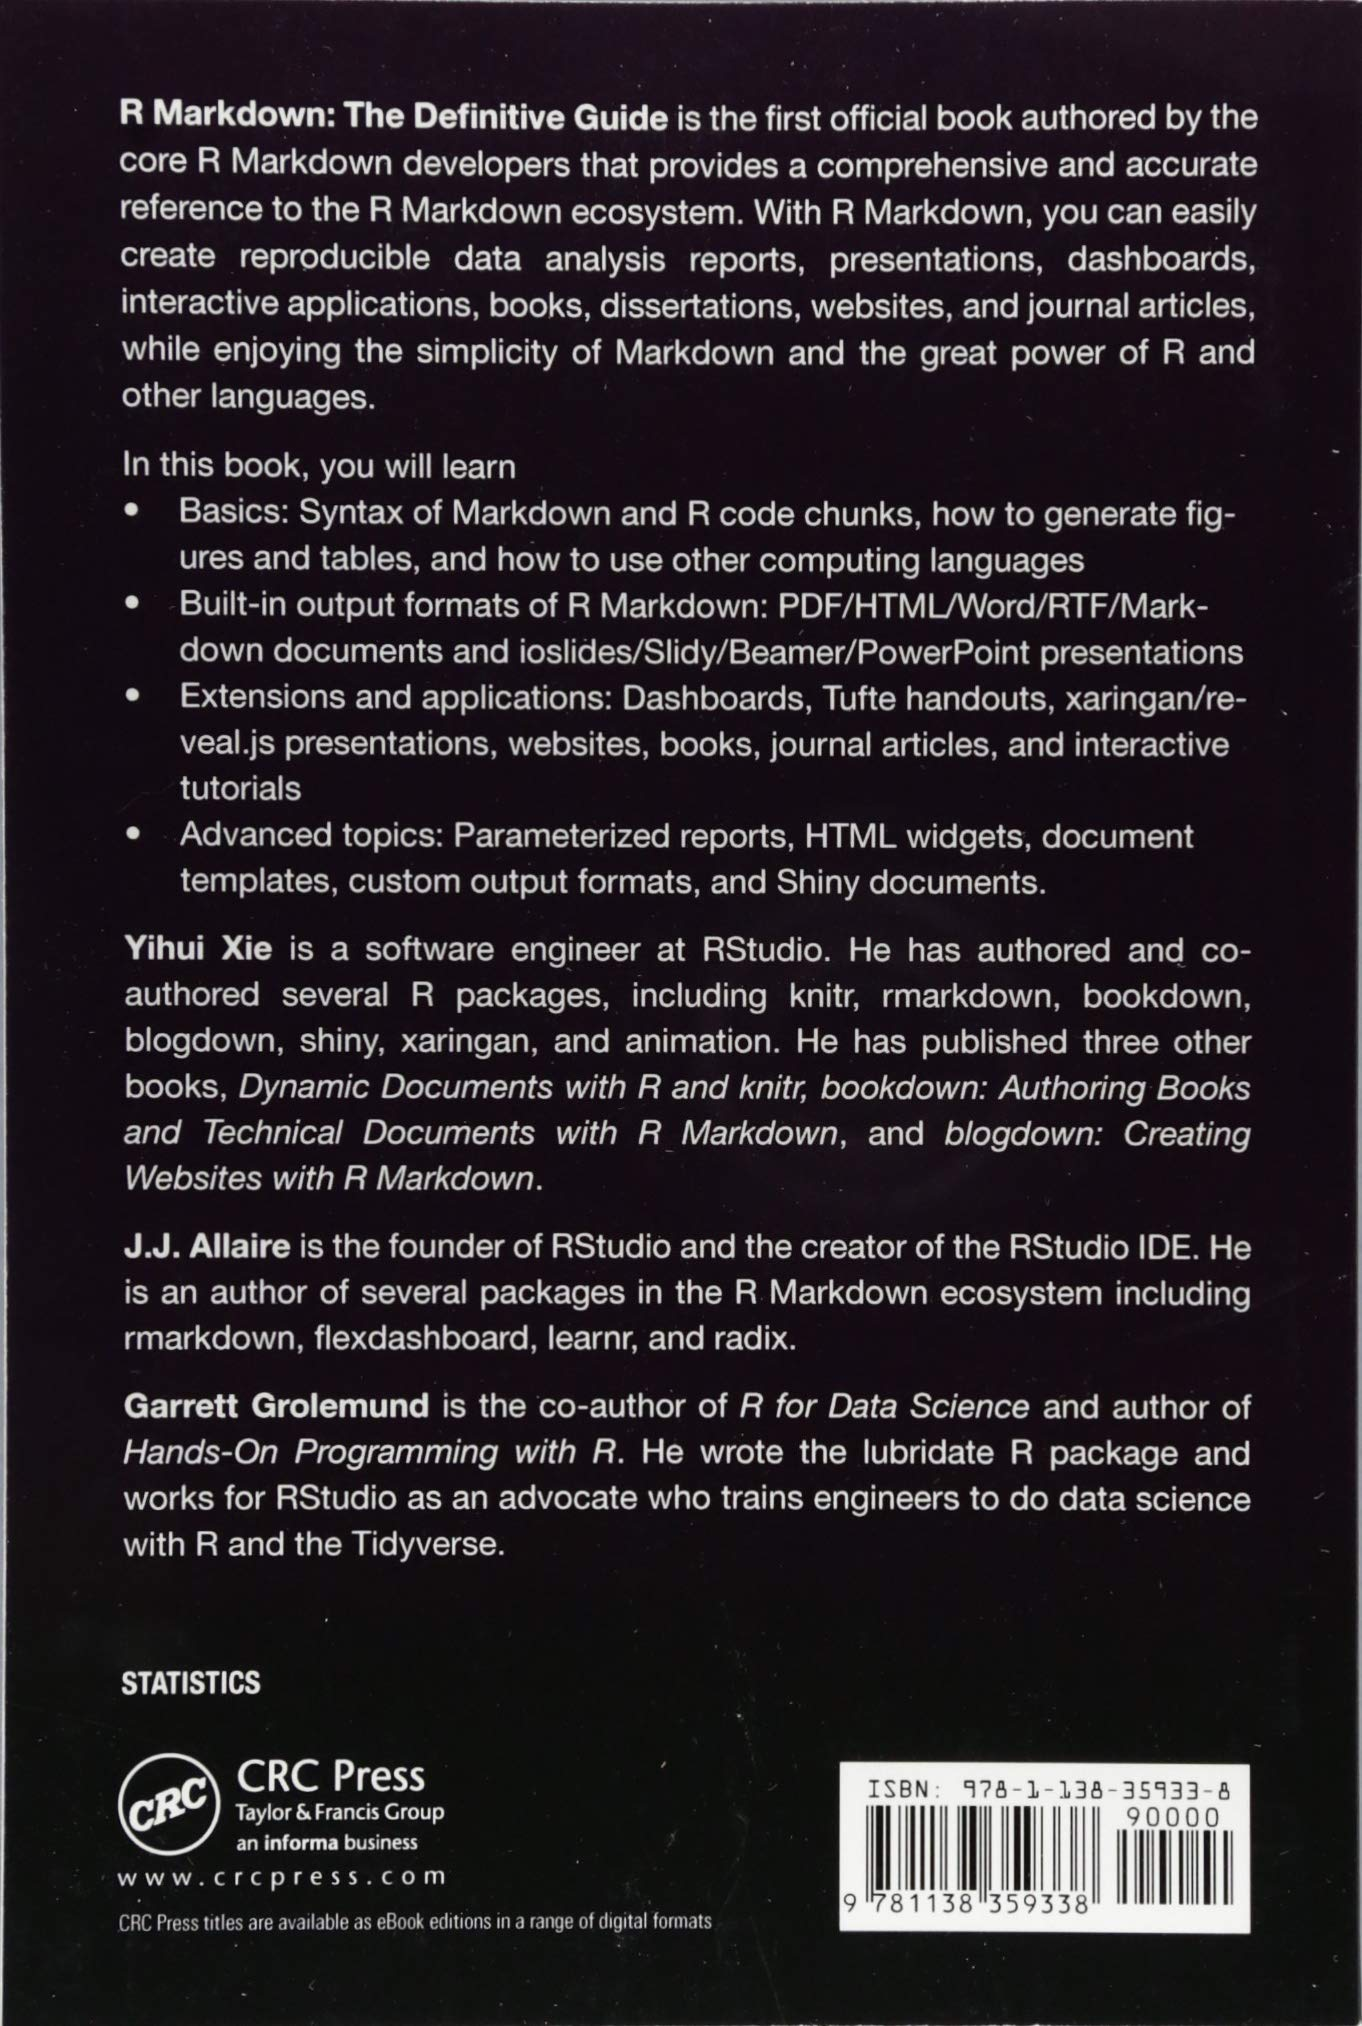 R Markdown: The Definitive Guide Chapman & Hall/CRC The R Series: Amazon.es: Yihui Xie, J.J. Allaire, Garrett Grolemund: Libros en idiomas extranjeros